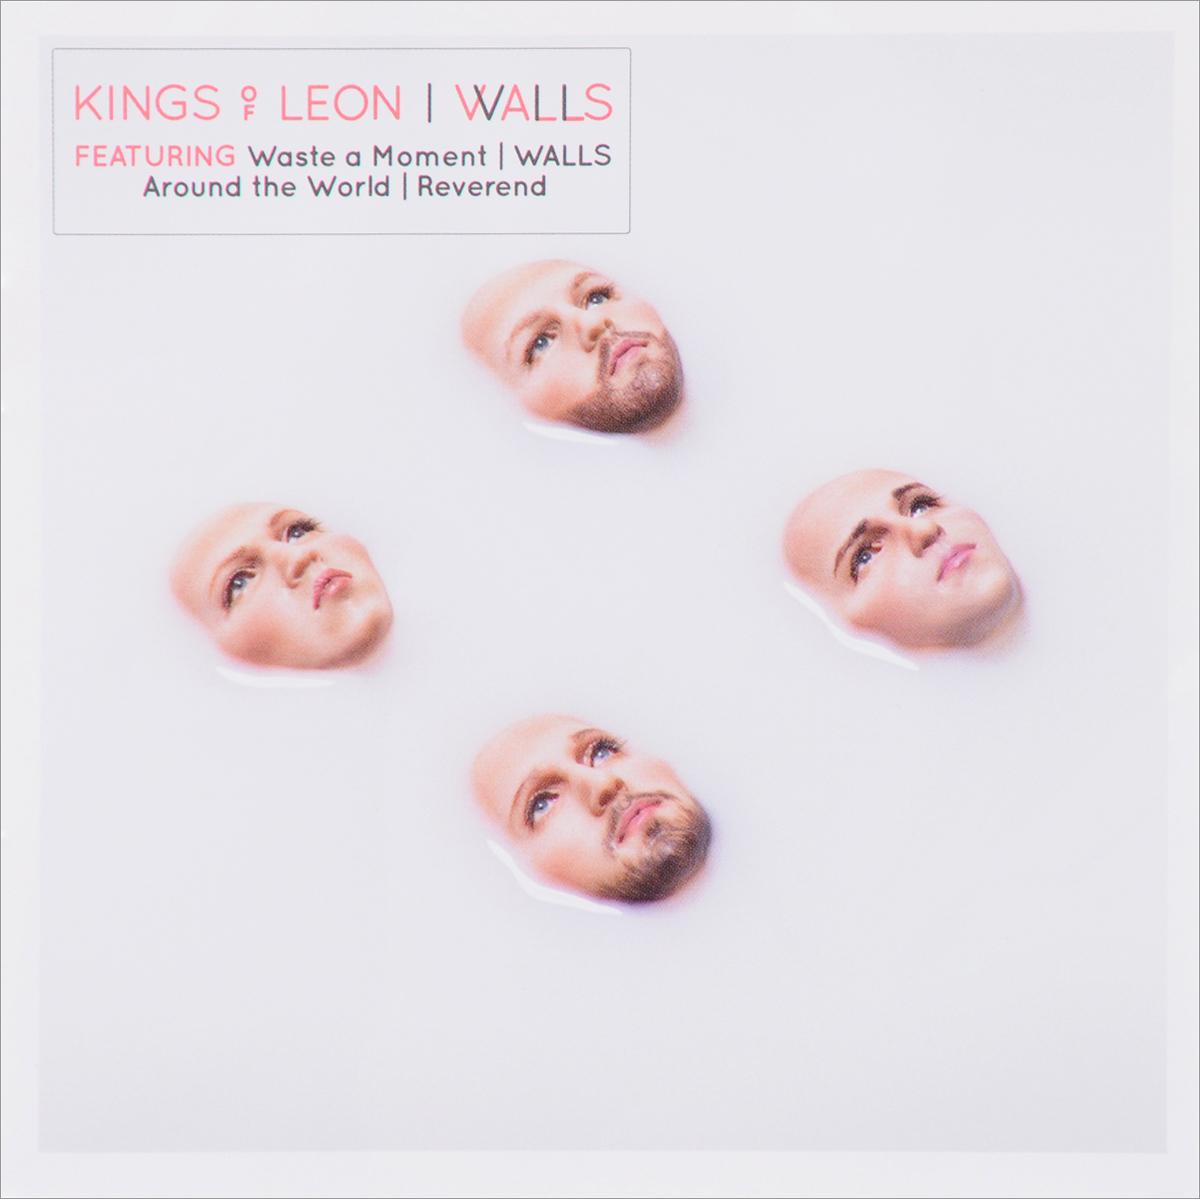 цена на Kings Of Leon Kings Of Leon. Walls